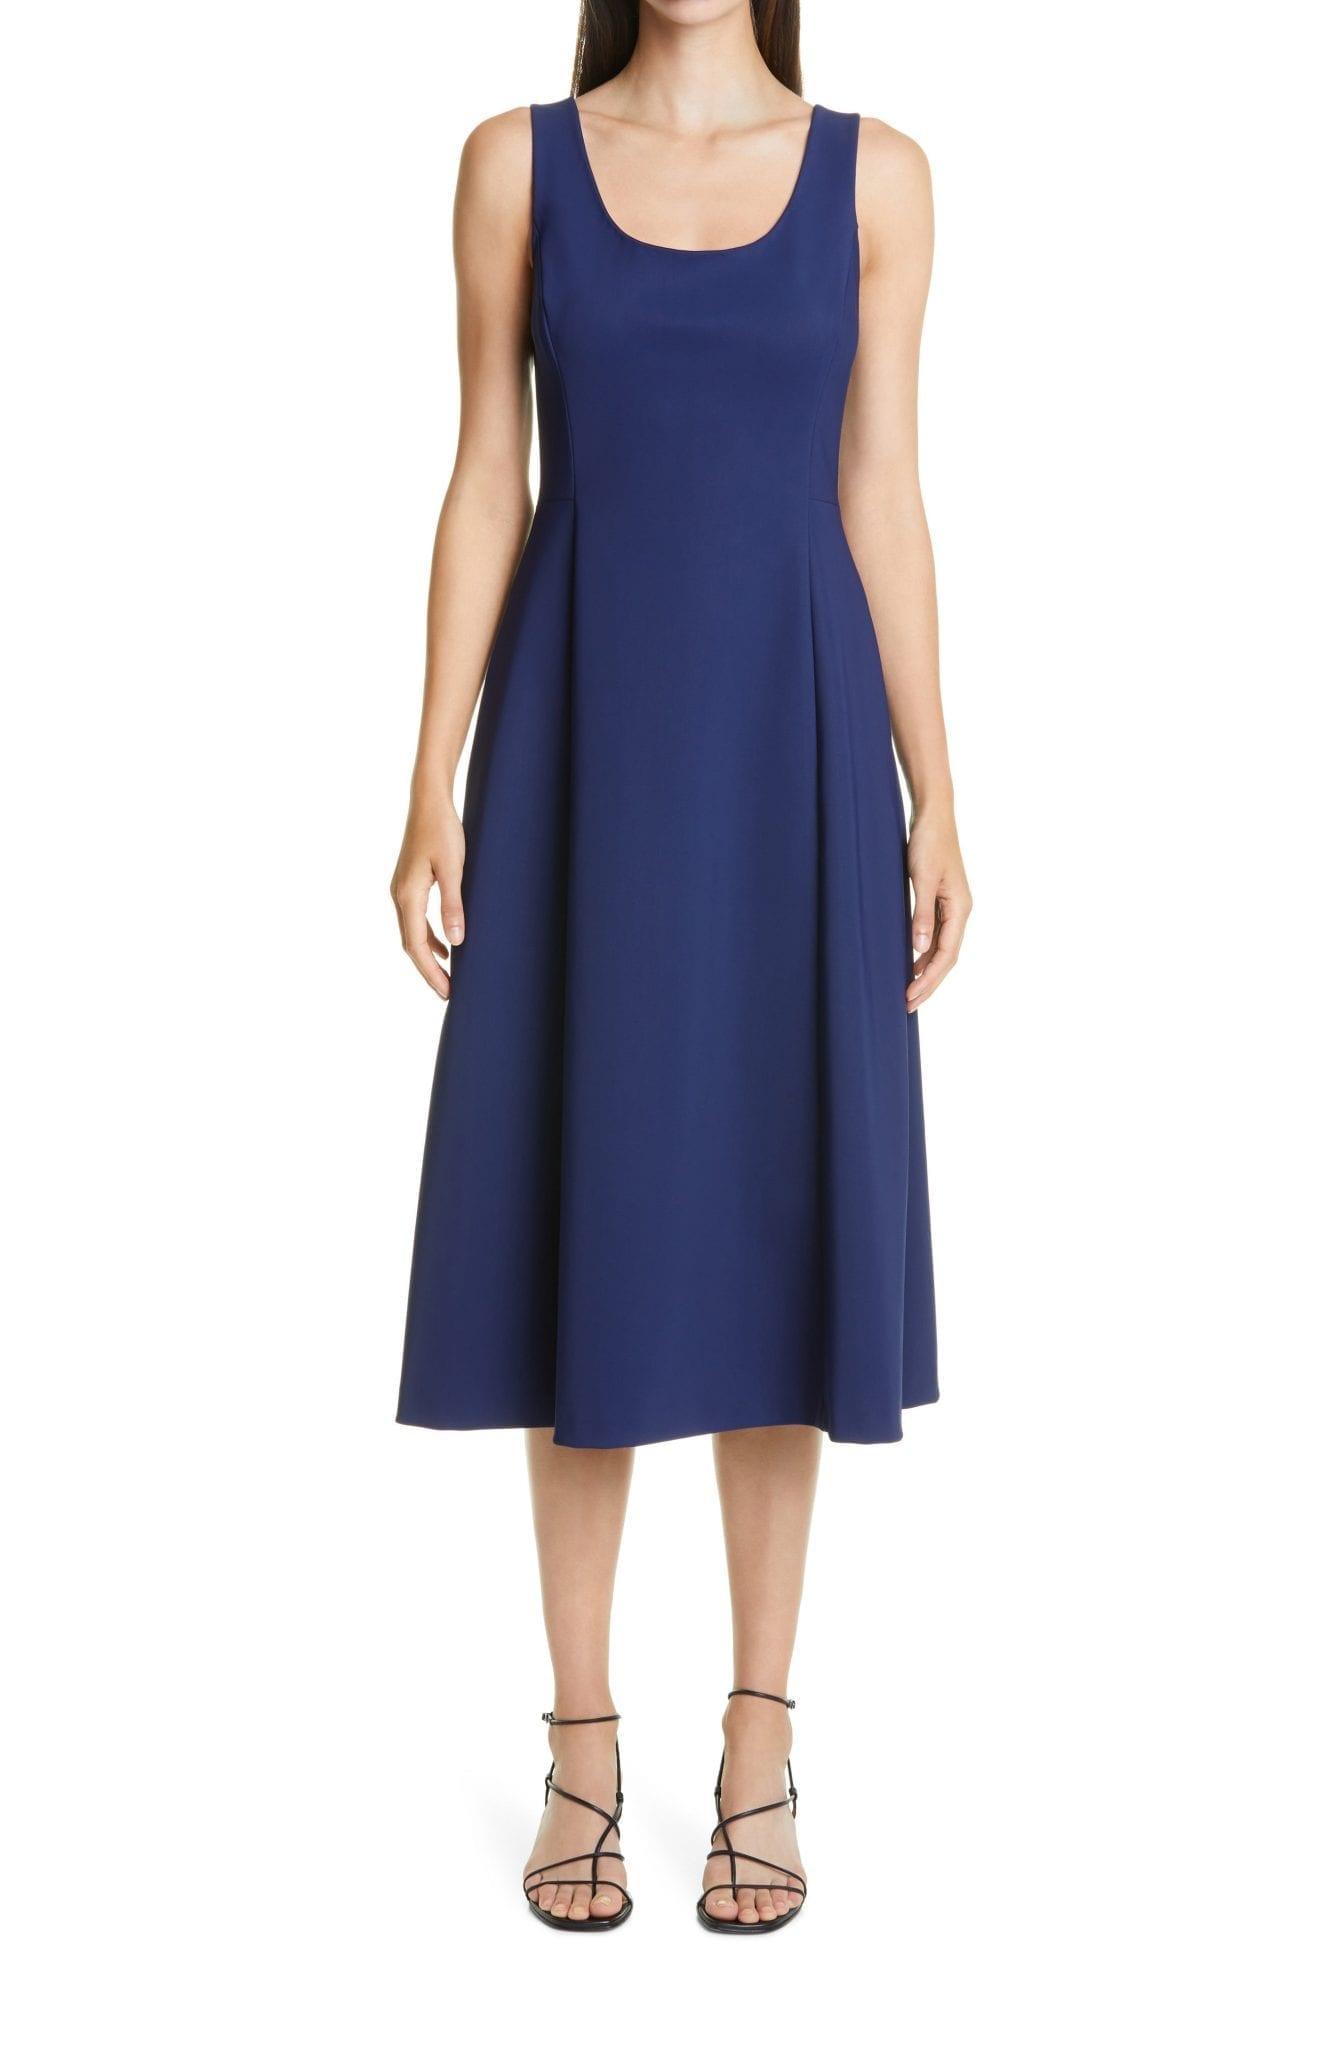 ADAM LIPPES Bonded Neopene Fit & Flare Midi Dress